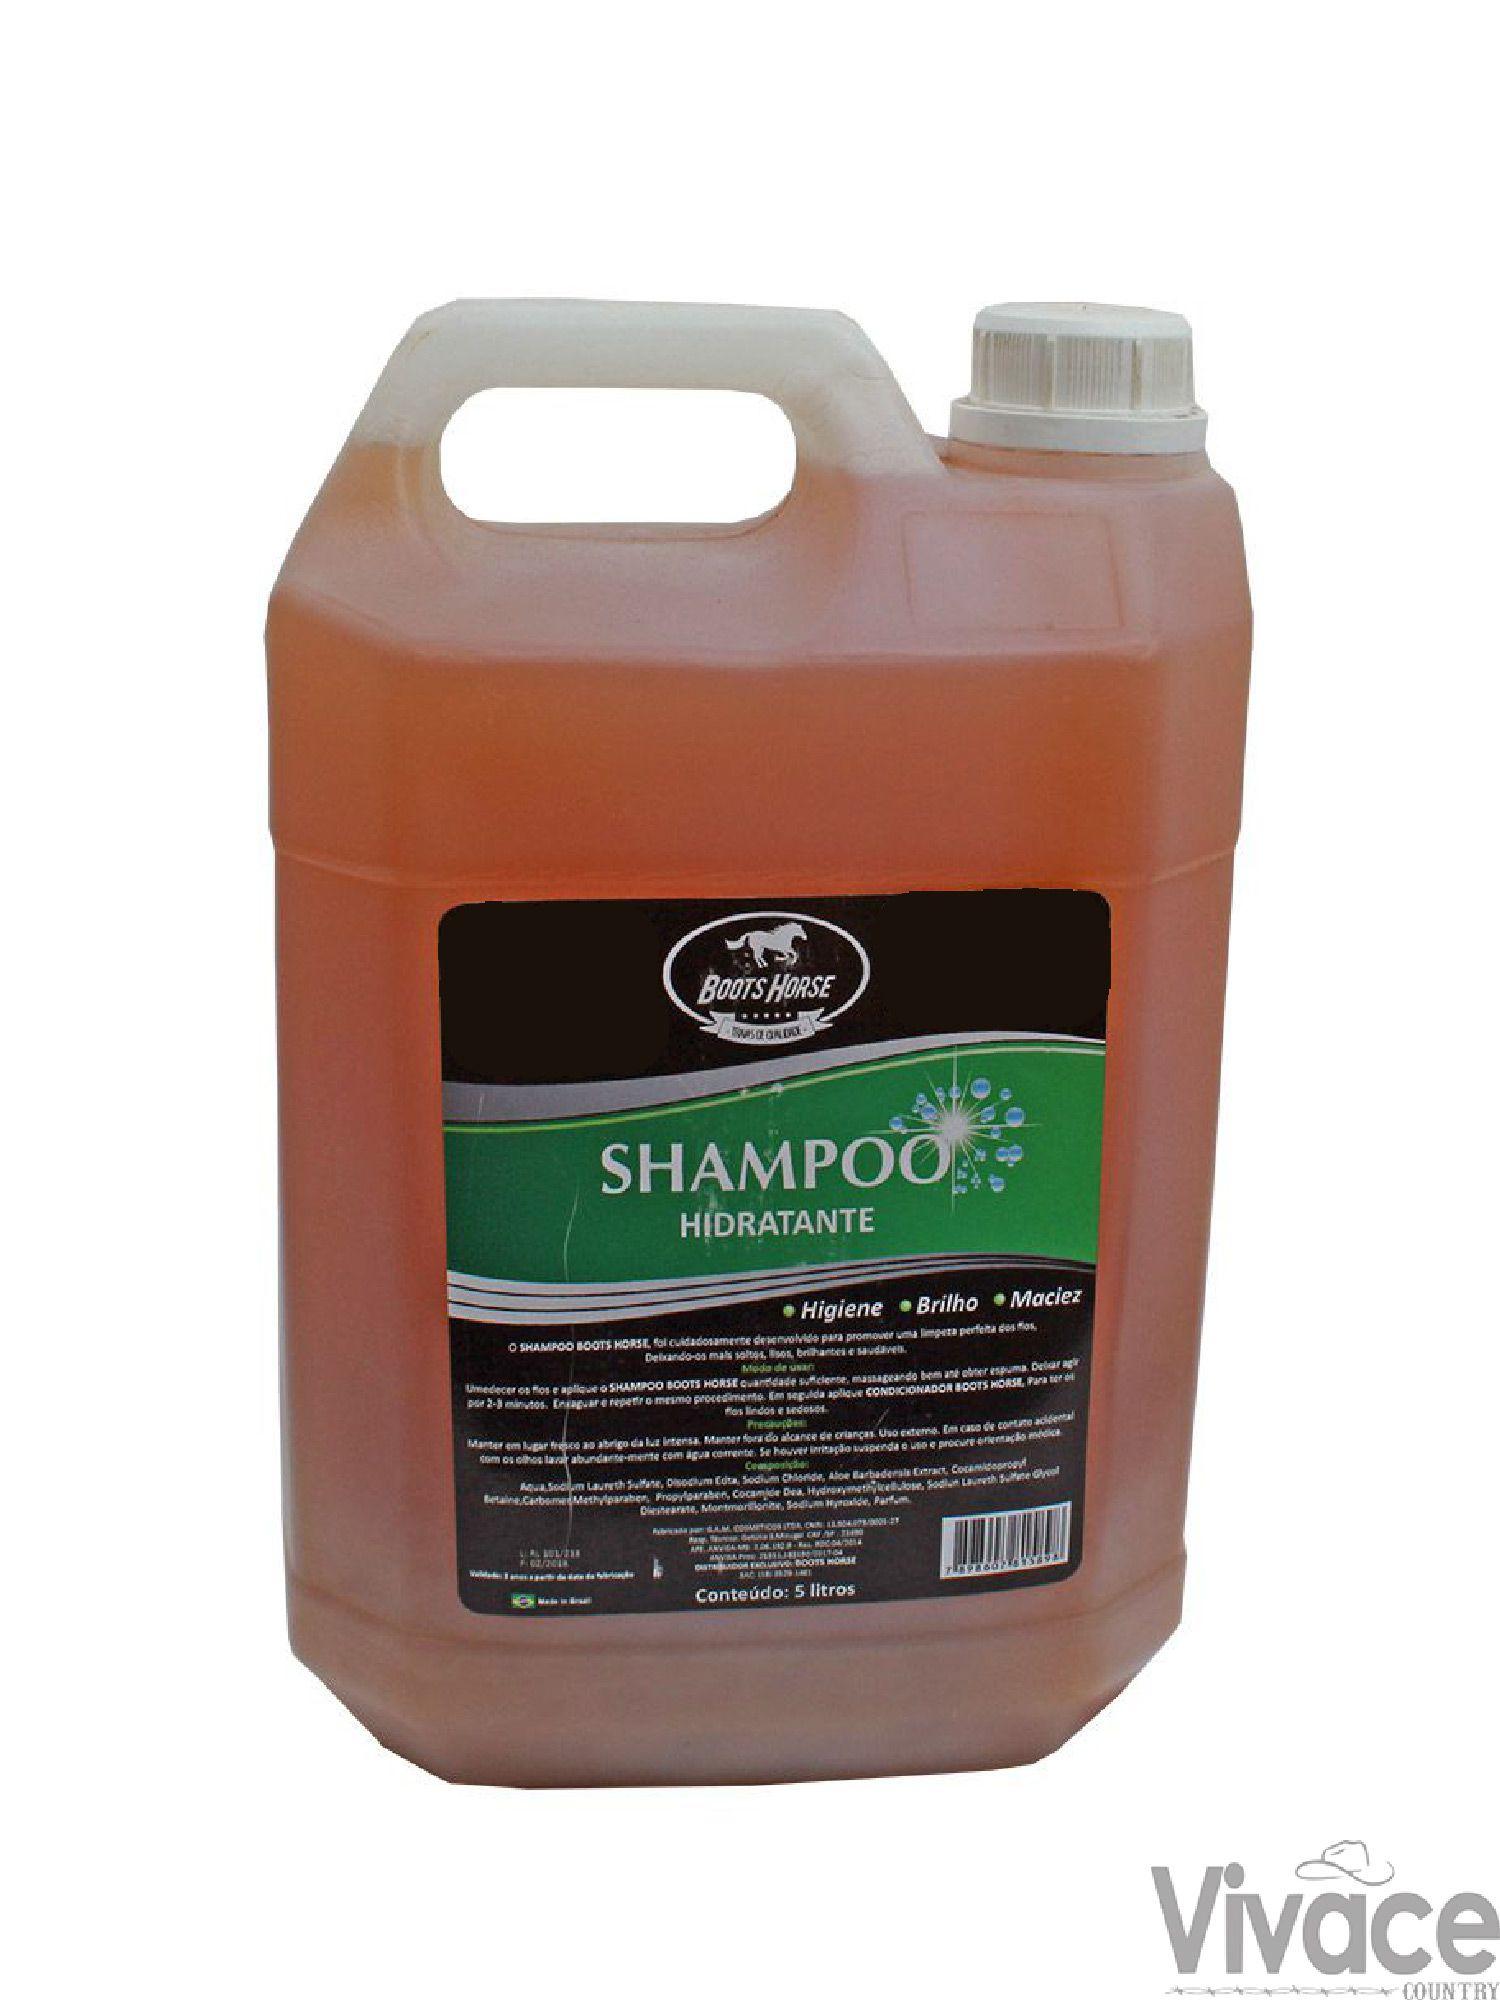 Shampoo c/ Hidratante Boots Horse 5 Litros